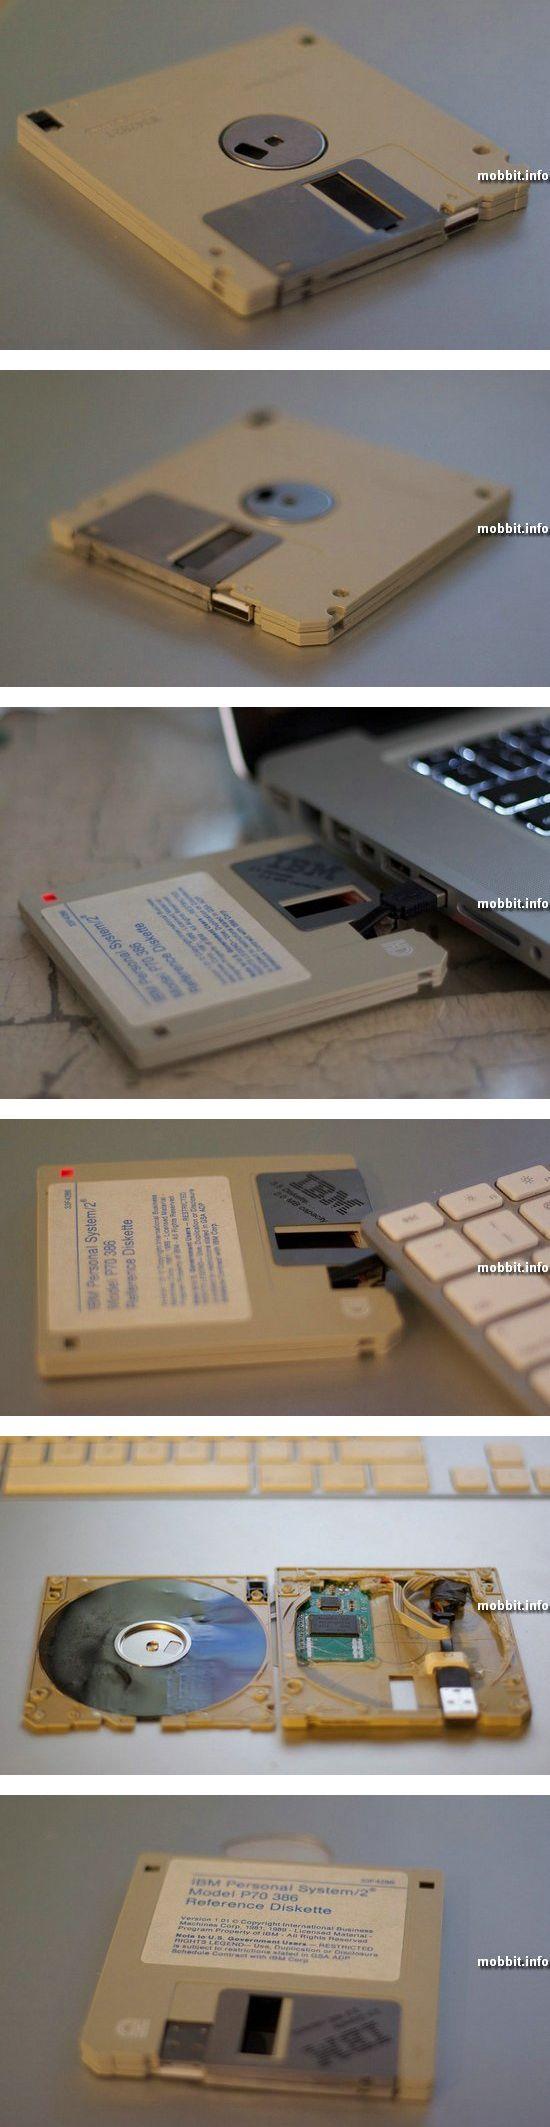 USB-флэшка из двух старых дискет